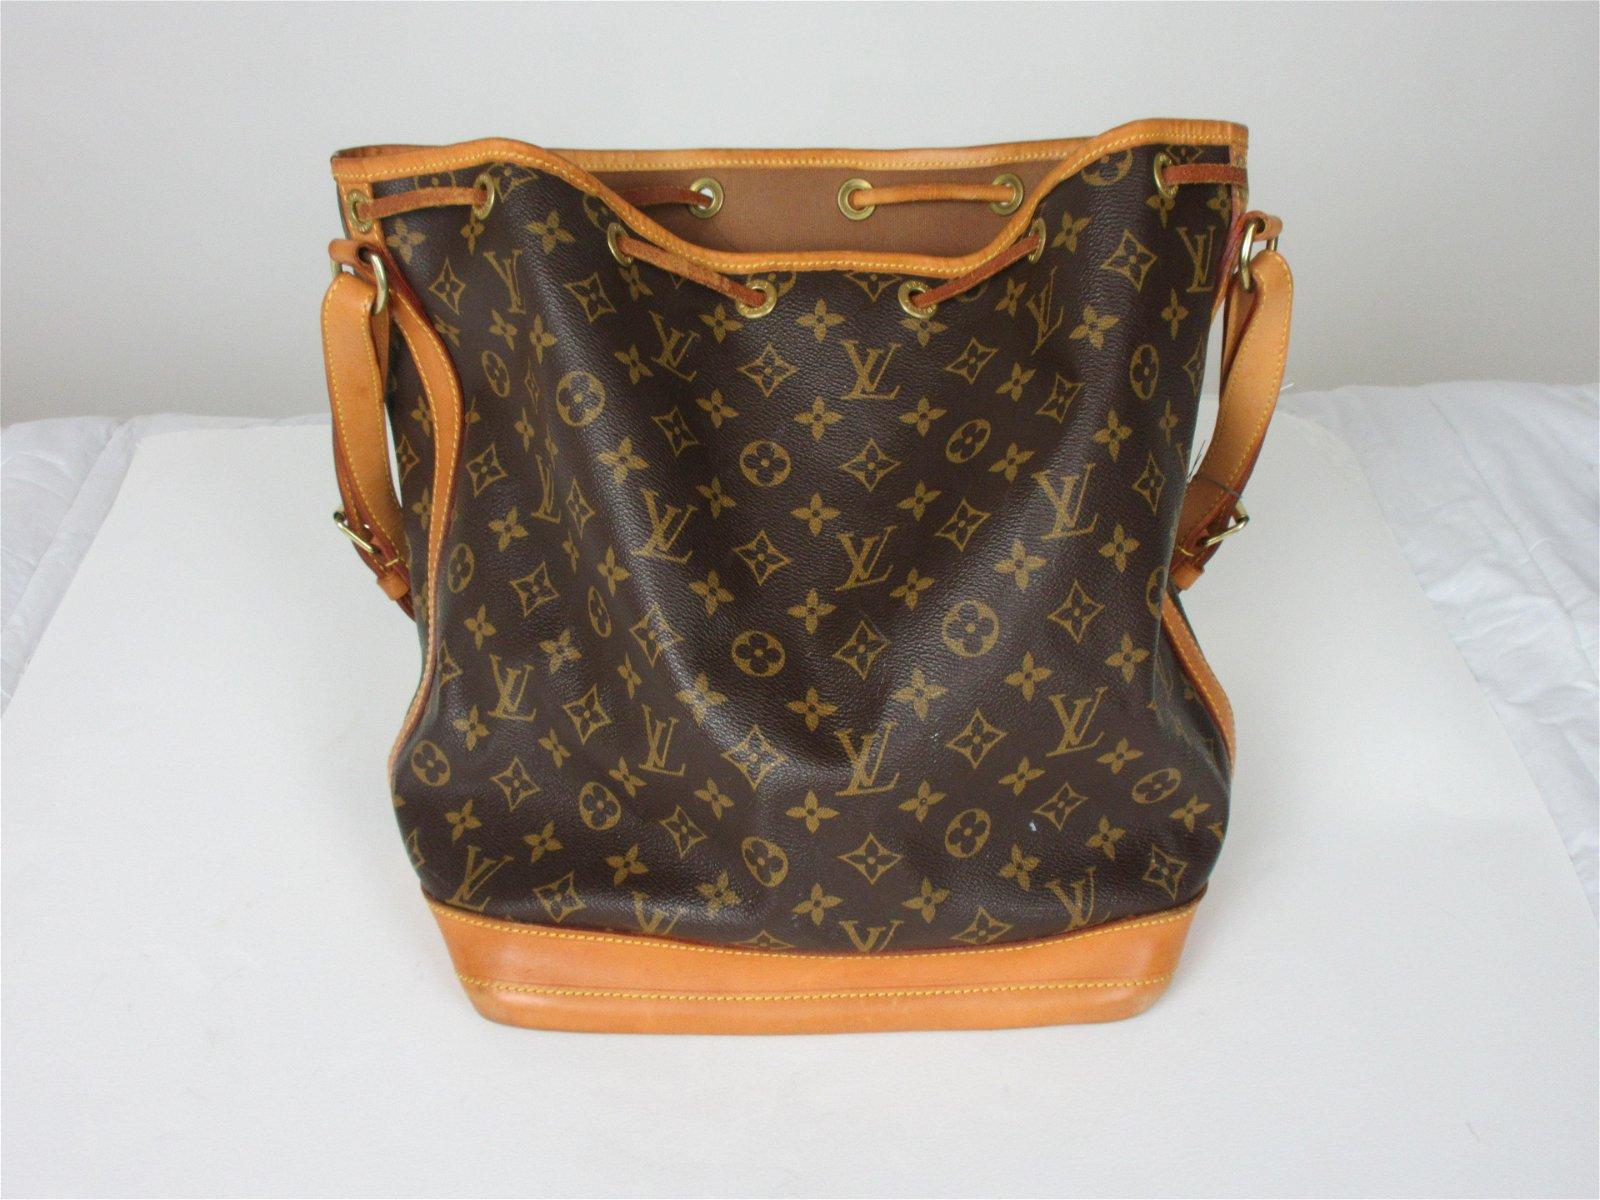 Leather Louis Vuitton Noe Handbag